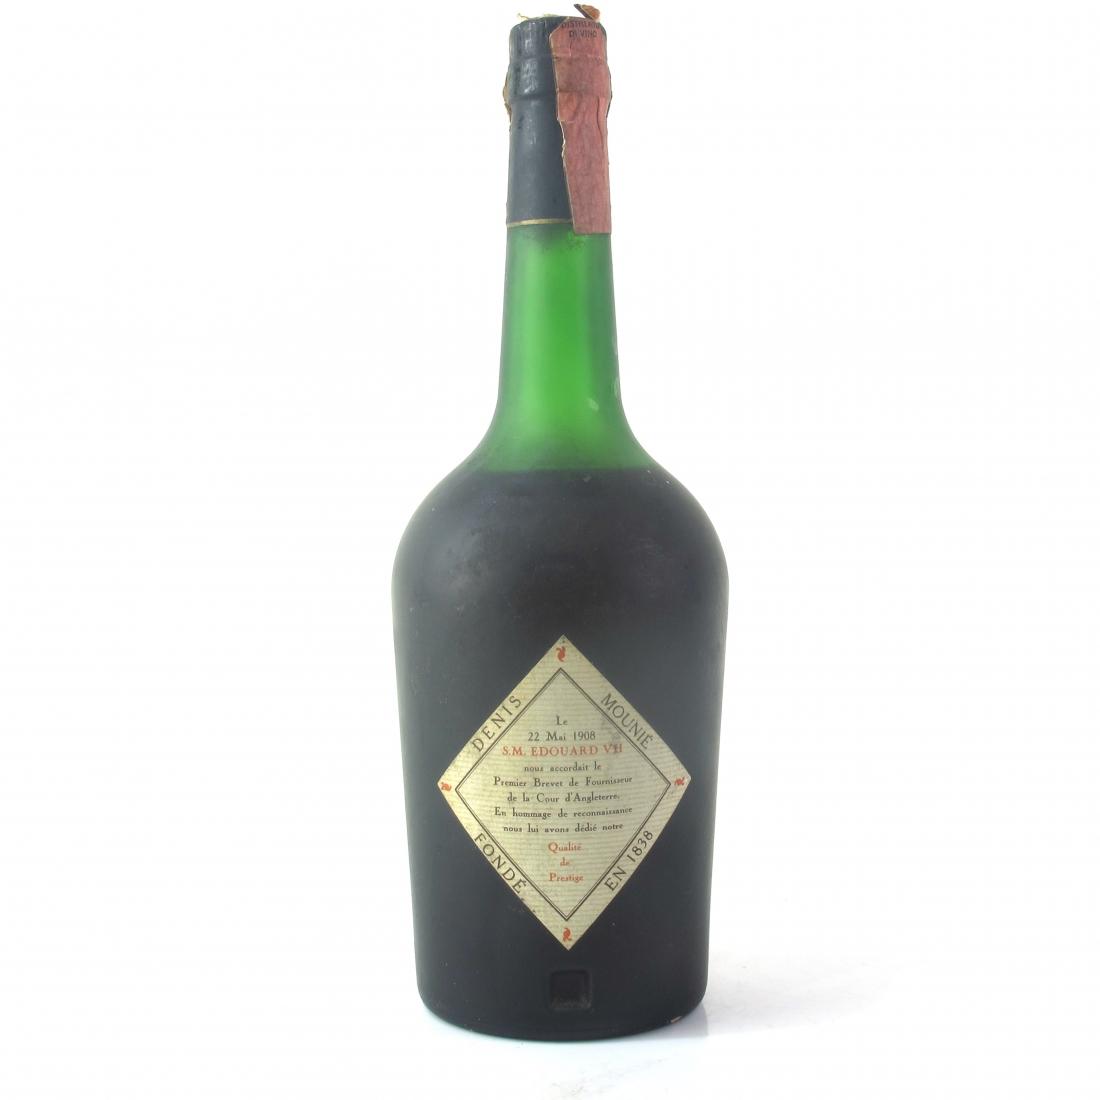 Denis-Mounie Grande Reserve Edovard VII Fine Champagne Cognac 1970s